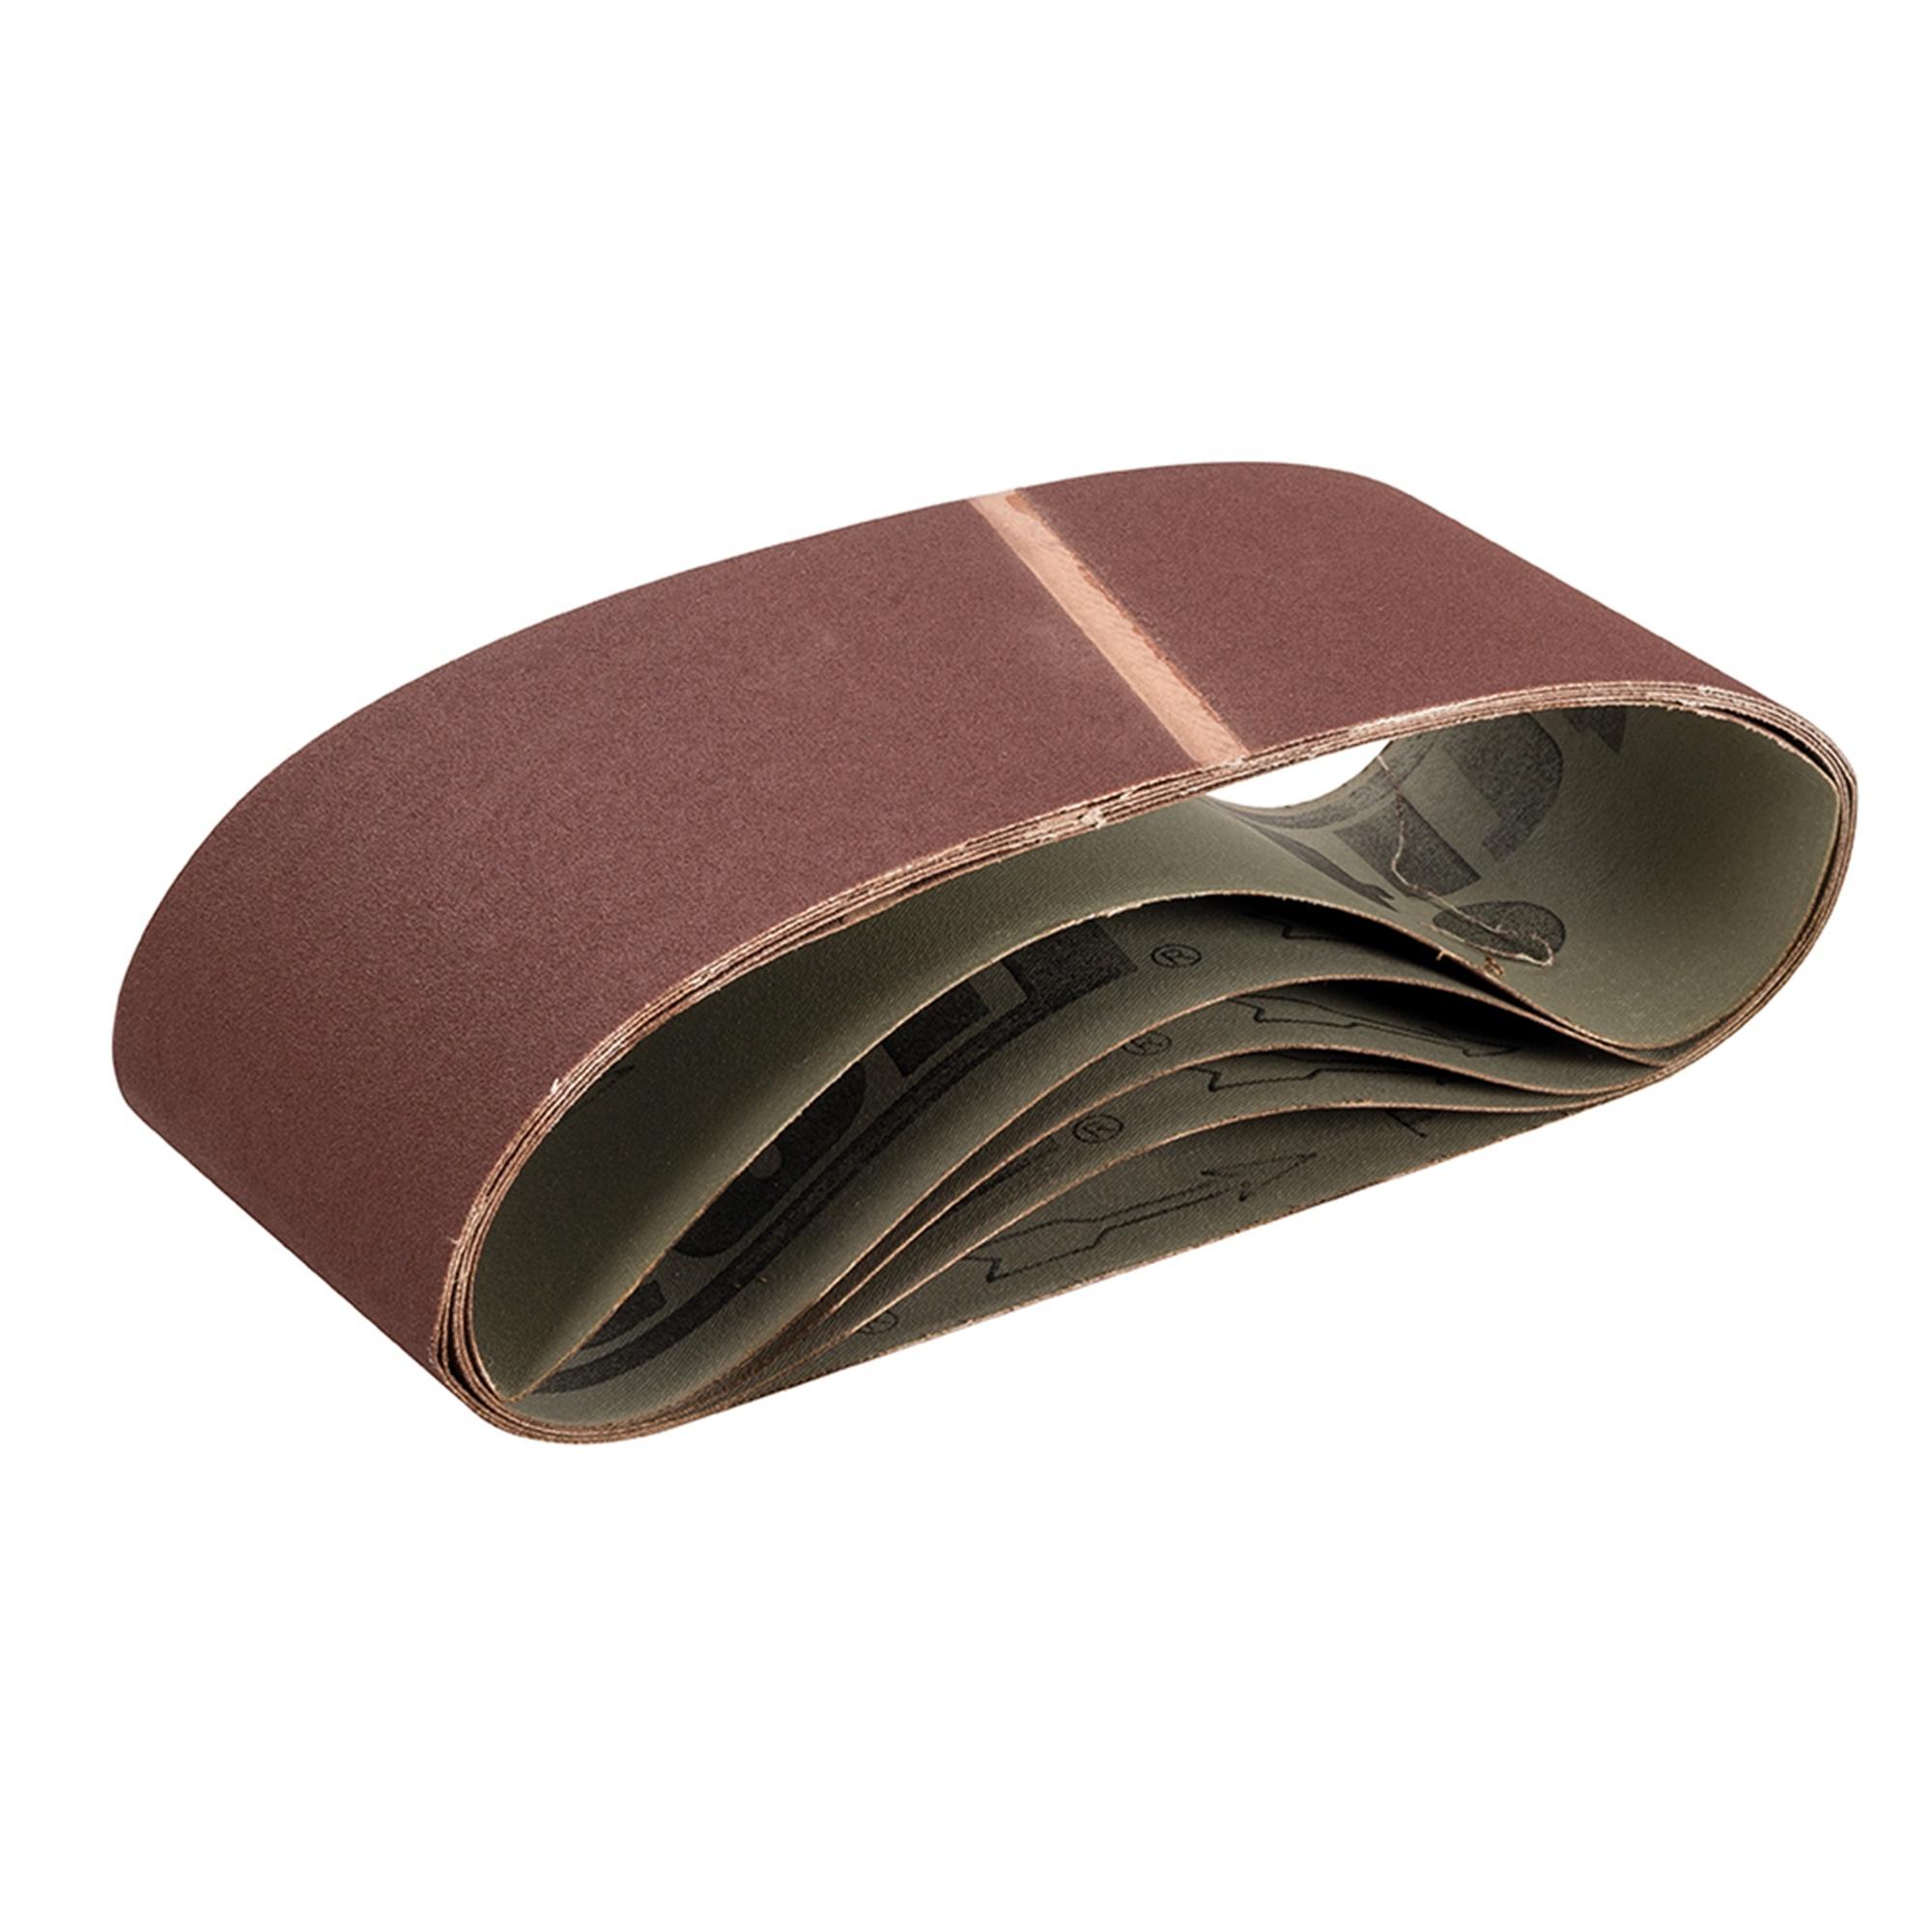 Triton Schuurband 100 x 610 mm - 150 Korrel - 5 stuks